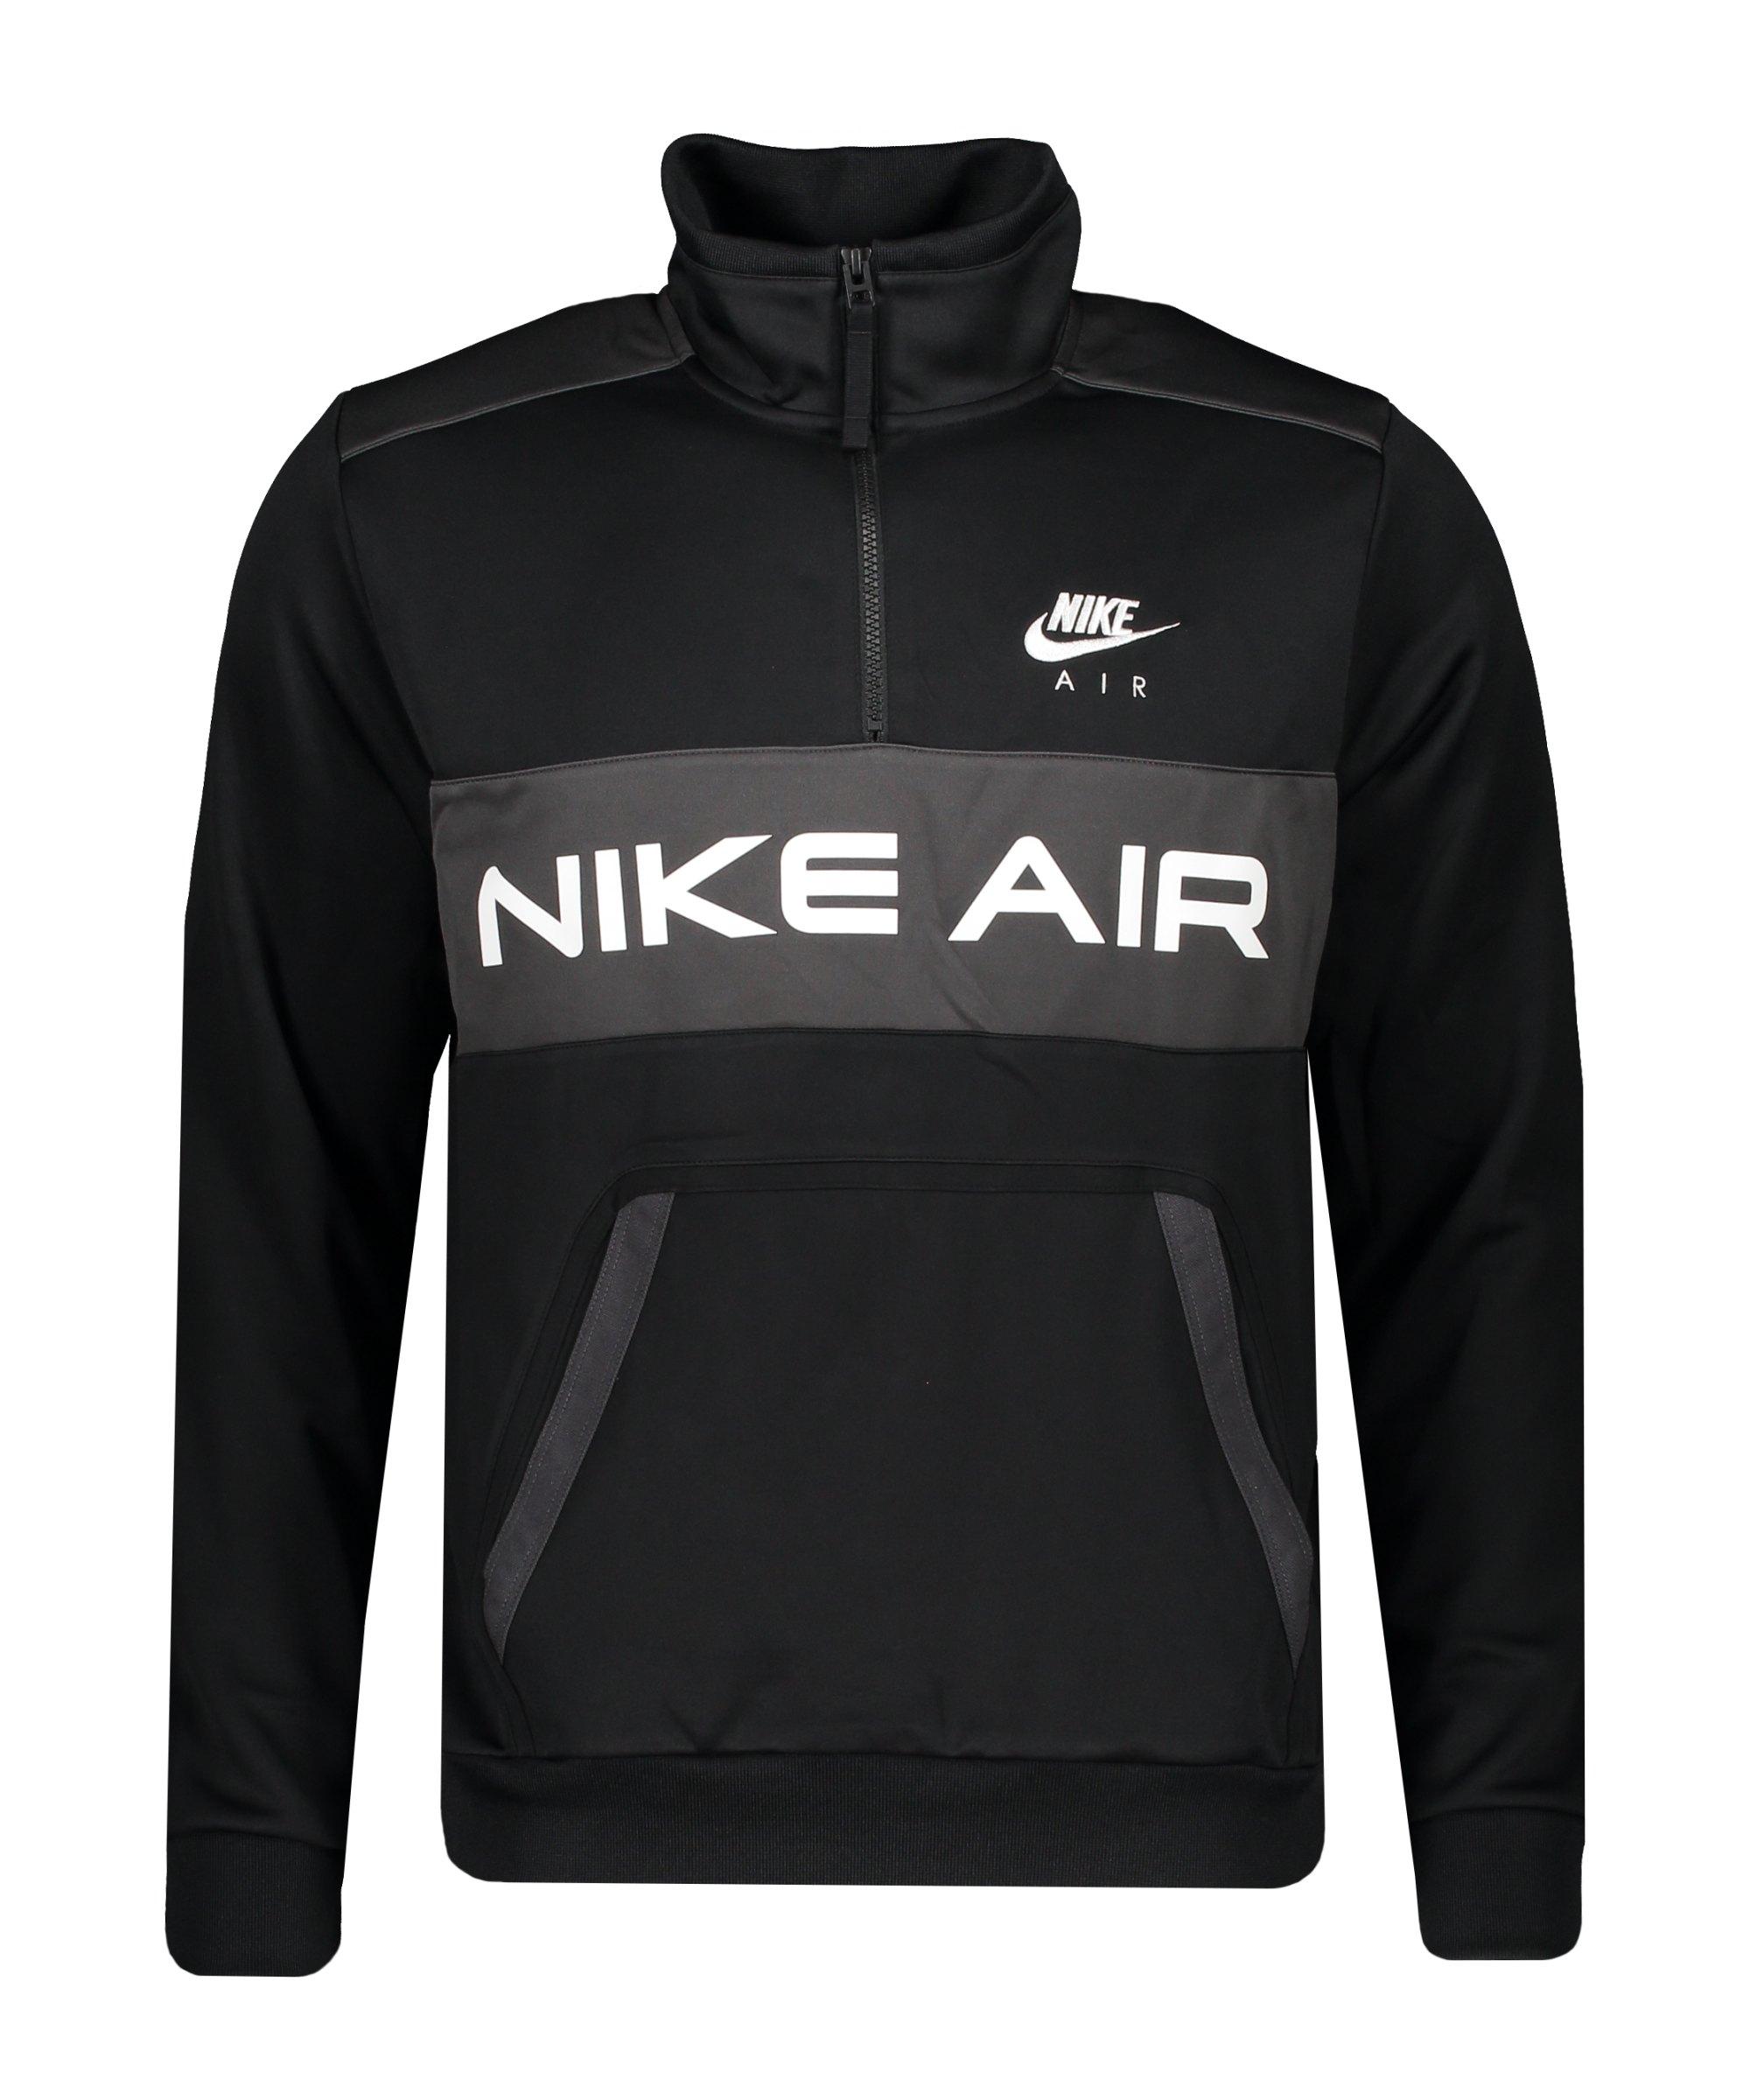 Nike Air Icon Jacke Schwarz Grau F010 - schwarz